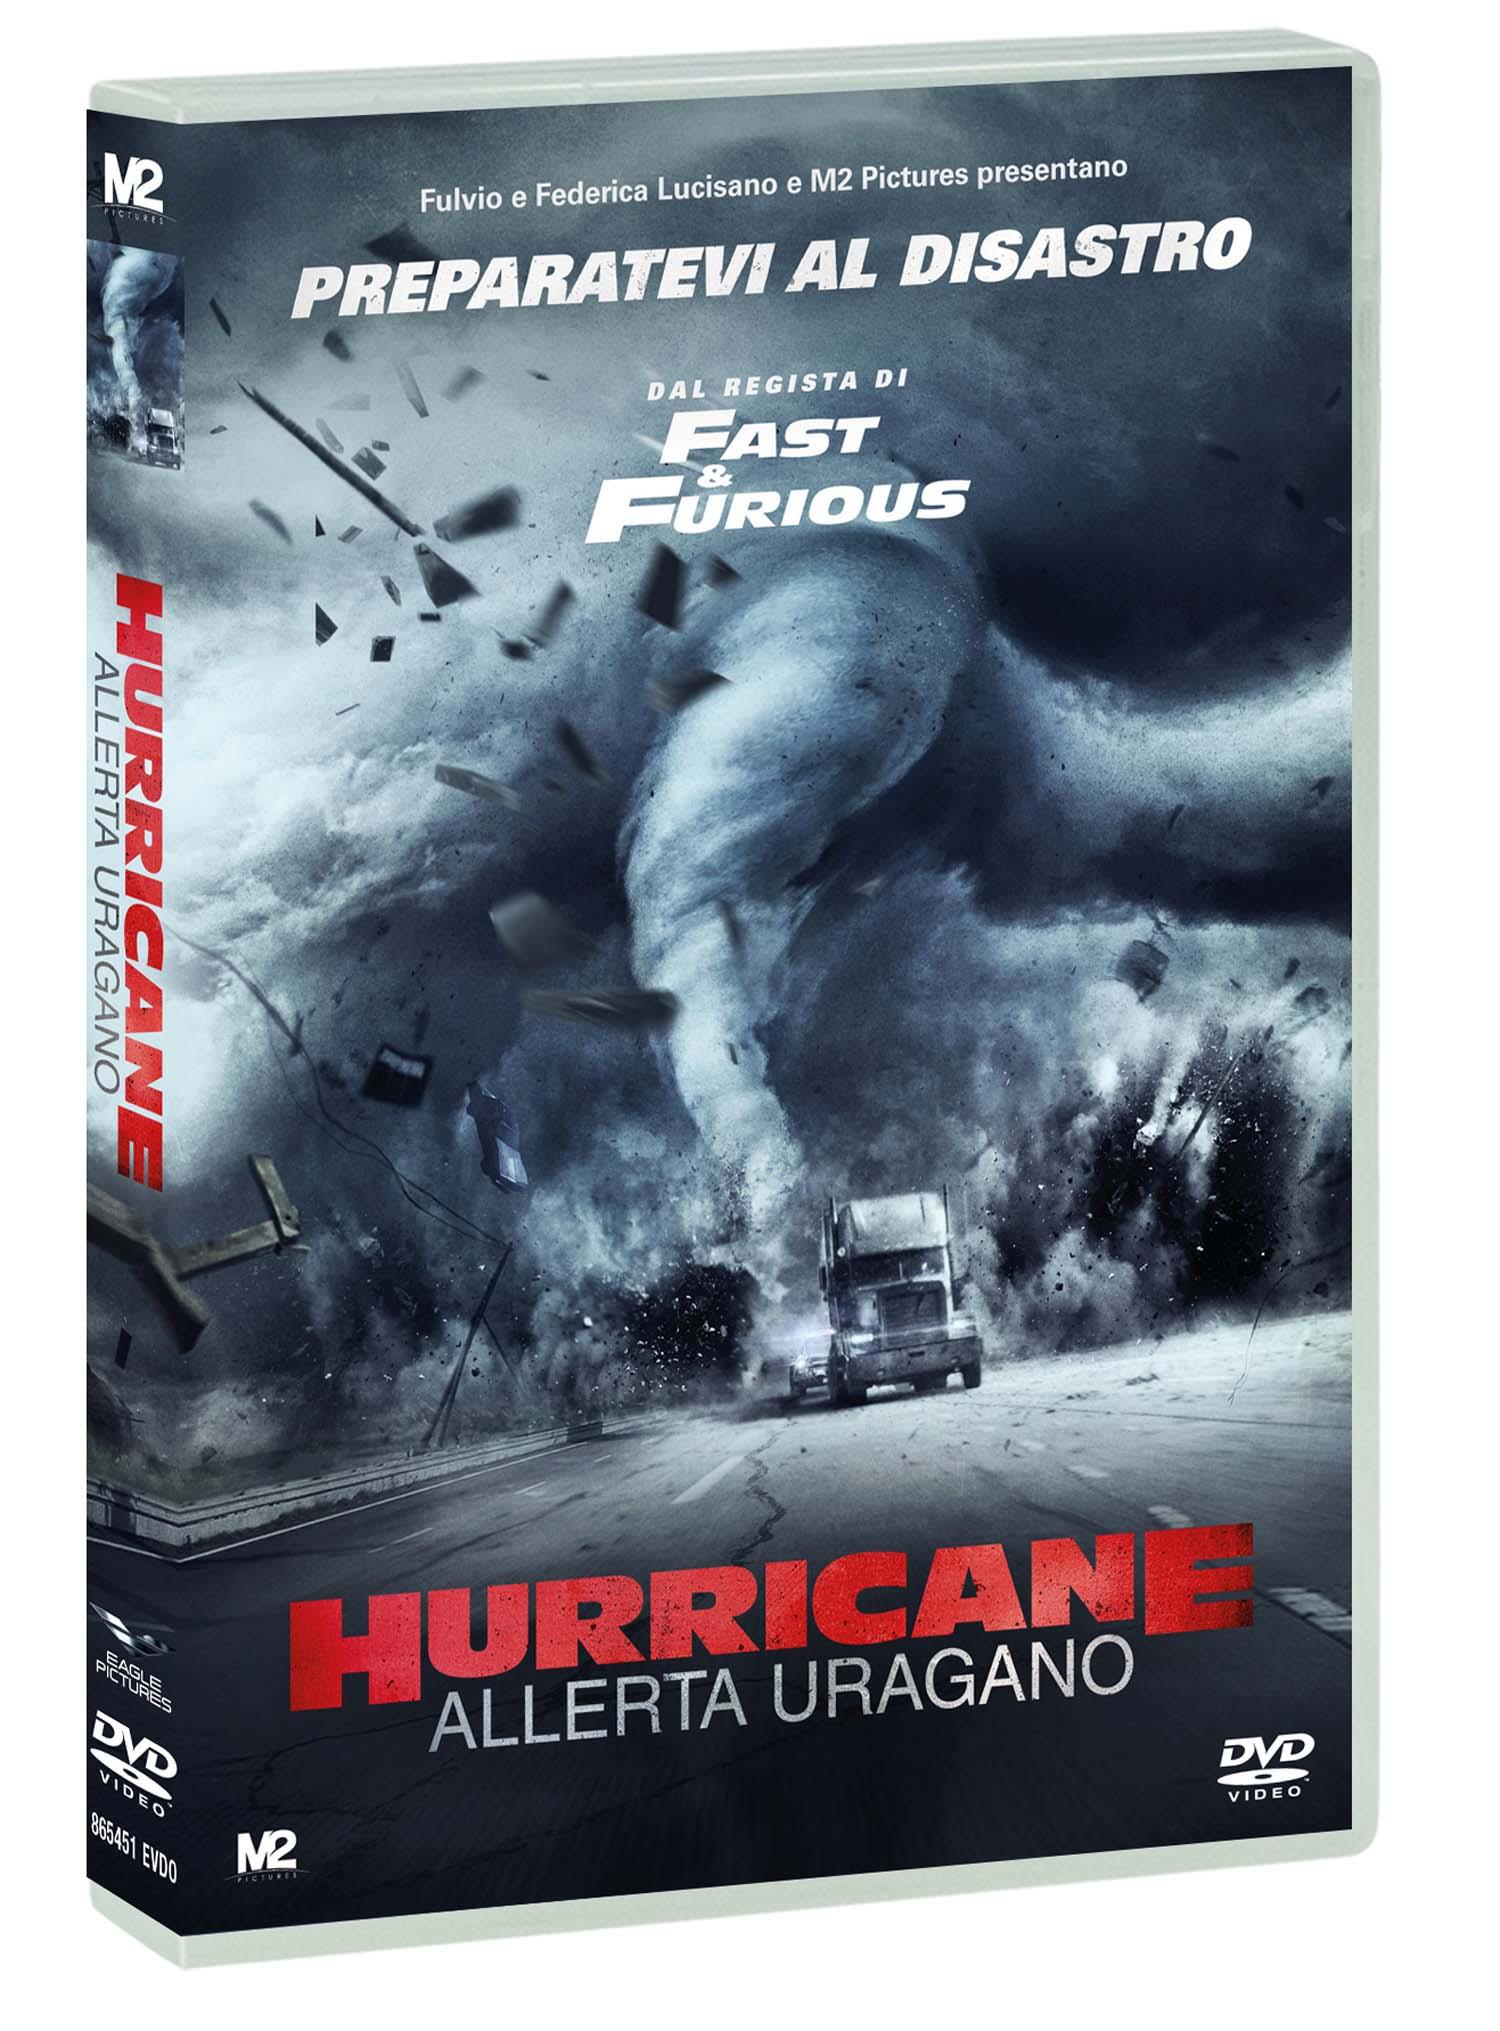 HURRICANE - ALLERTA URAGANO (DVD)